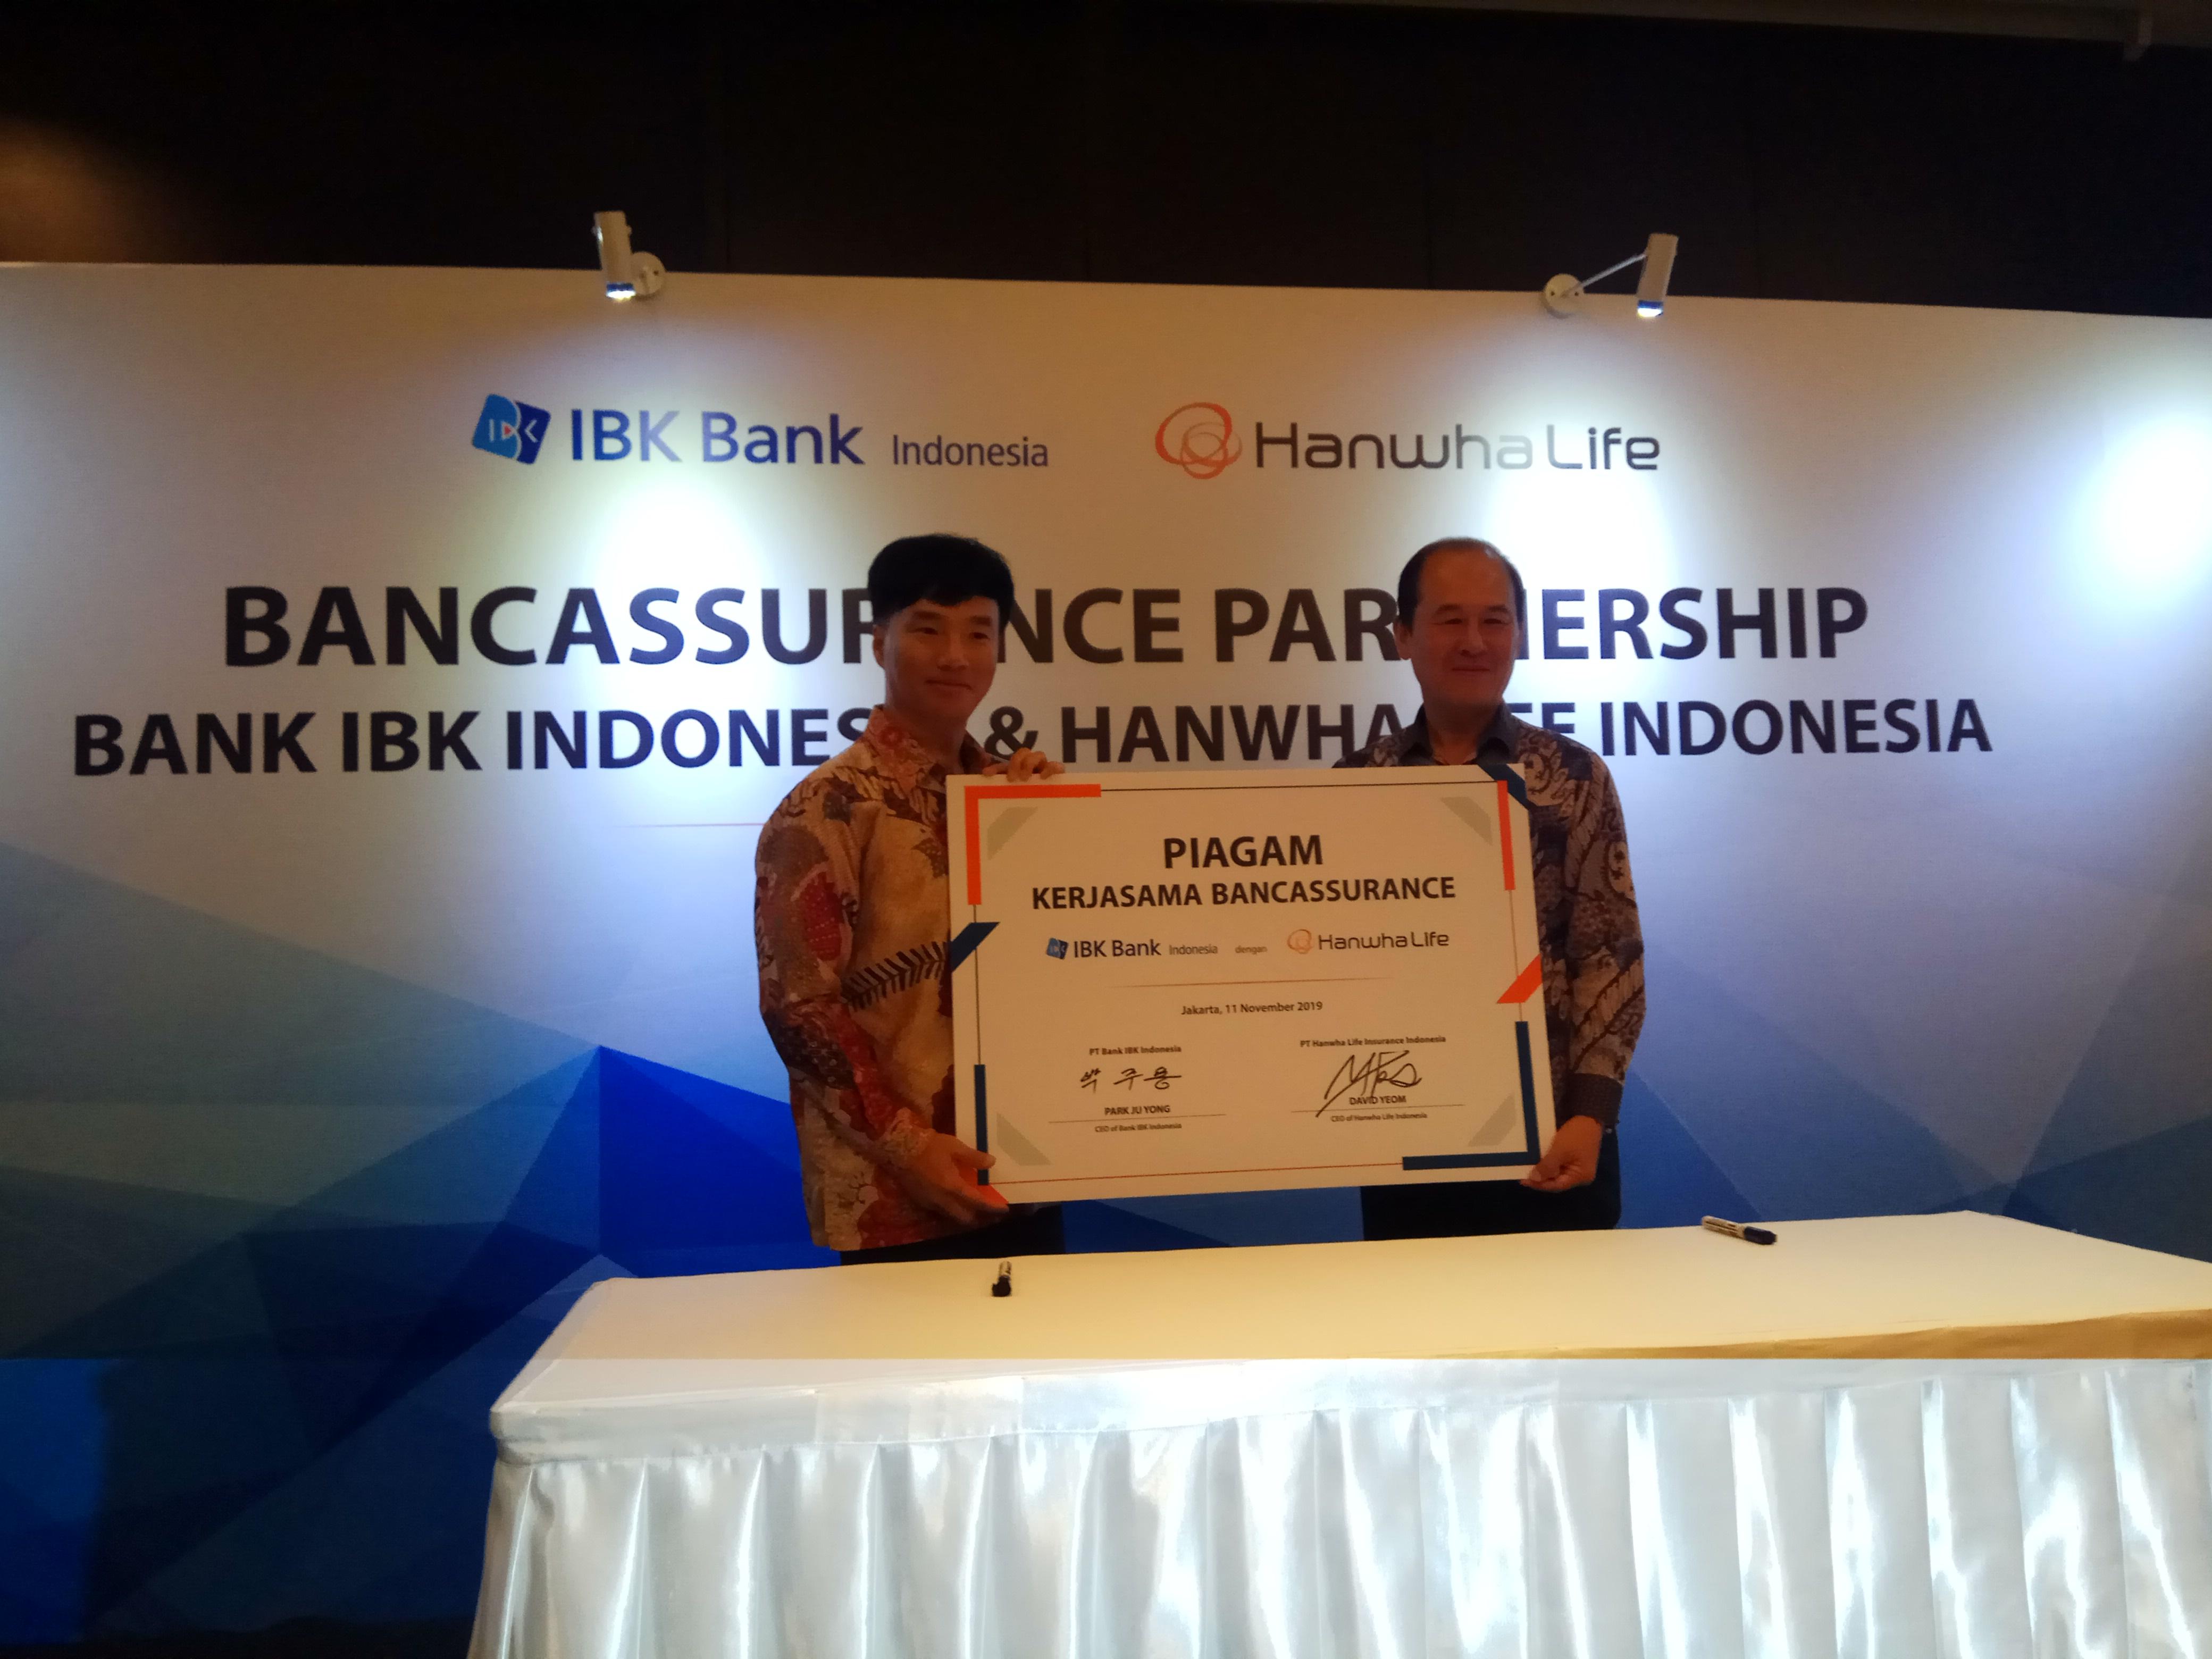 Hanwha Life dan Bank IBK Indonesia Jalin Kerjasama Bancassurance